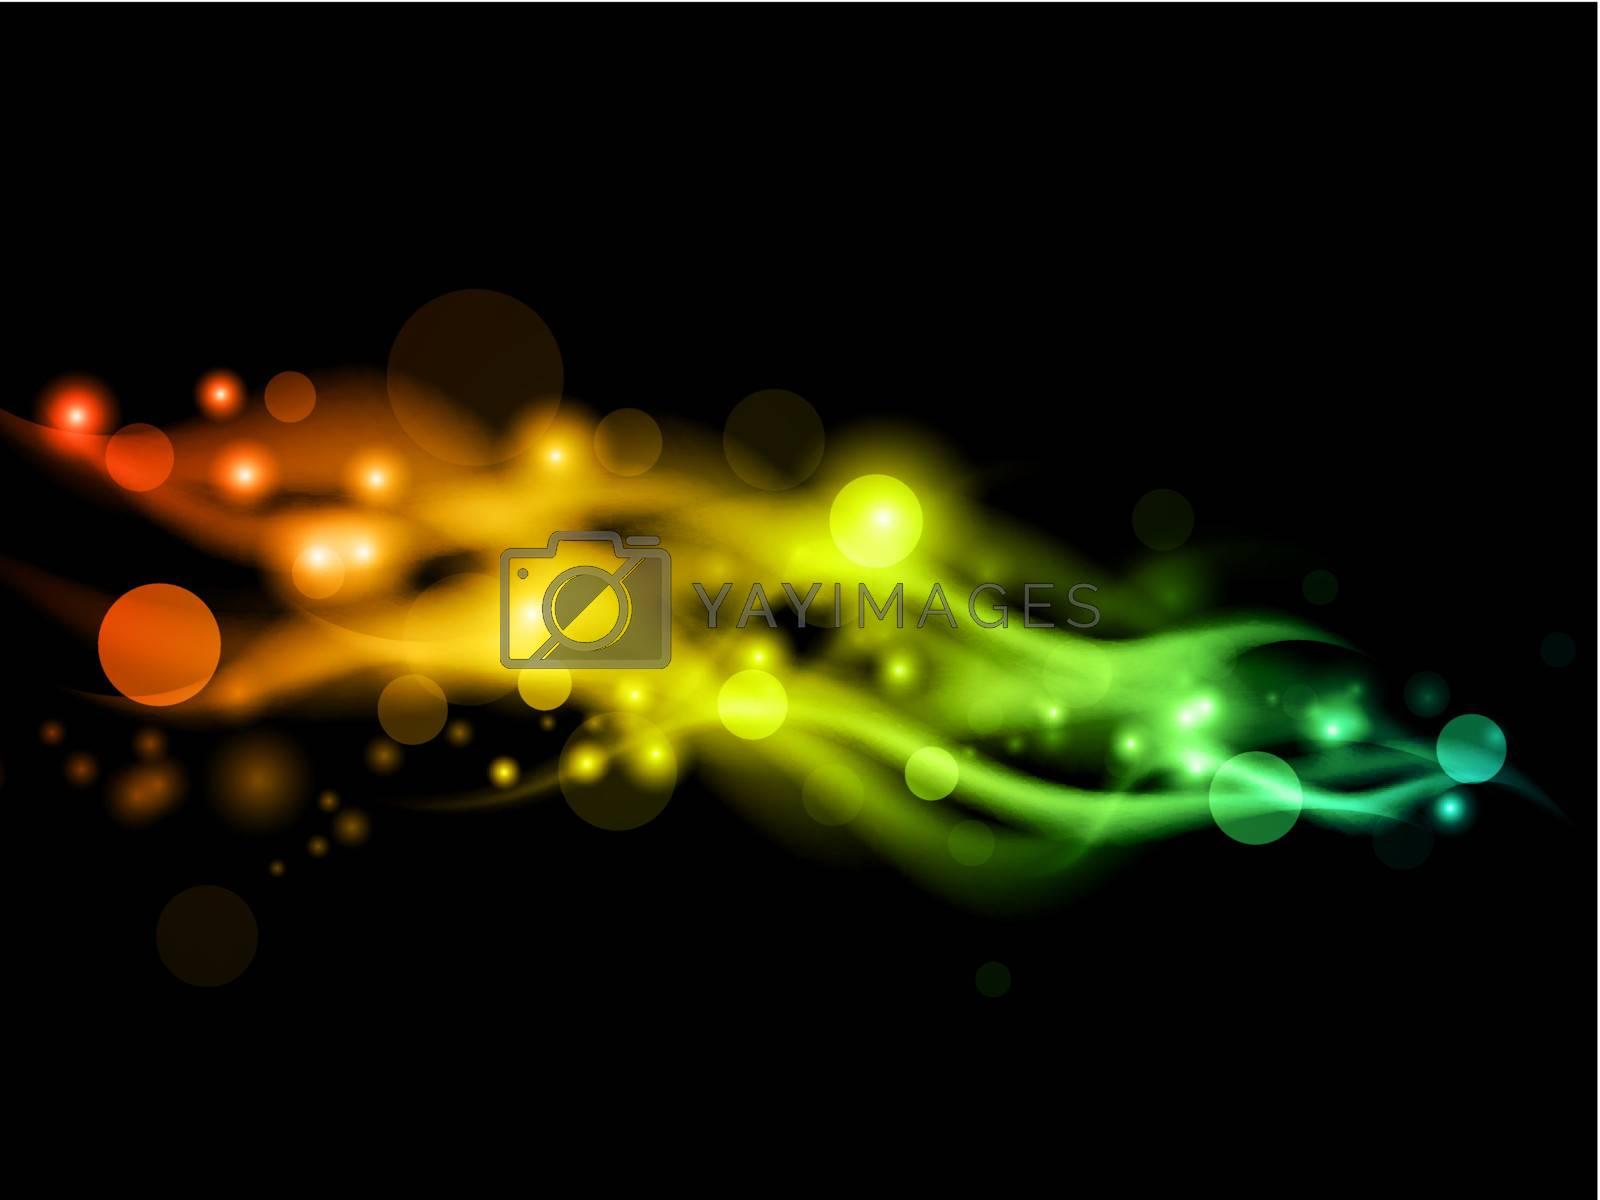 Royalty free image of abstract background by razvodovska